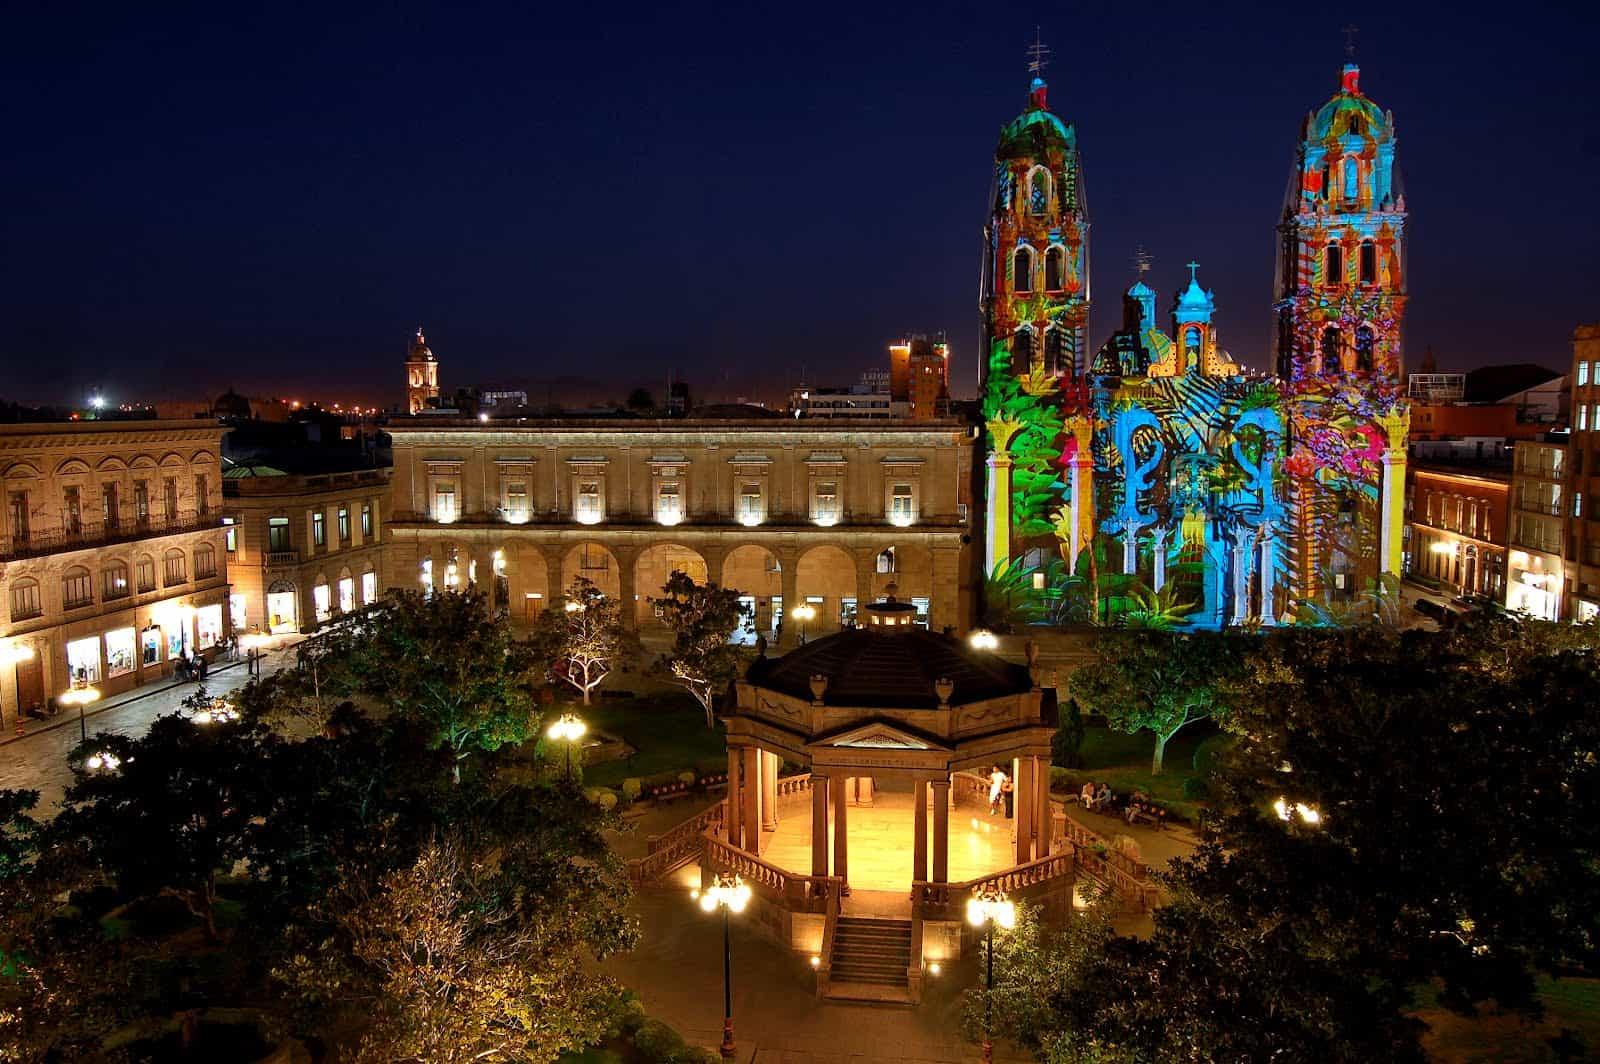 MEXICANOS PREFIEREN DESTINOS PLAYA GRITO EXPEDIA 02